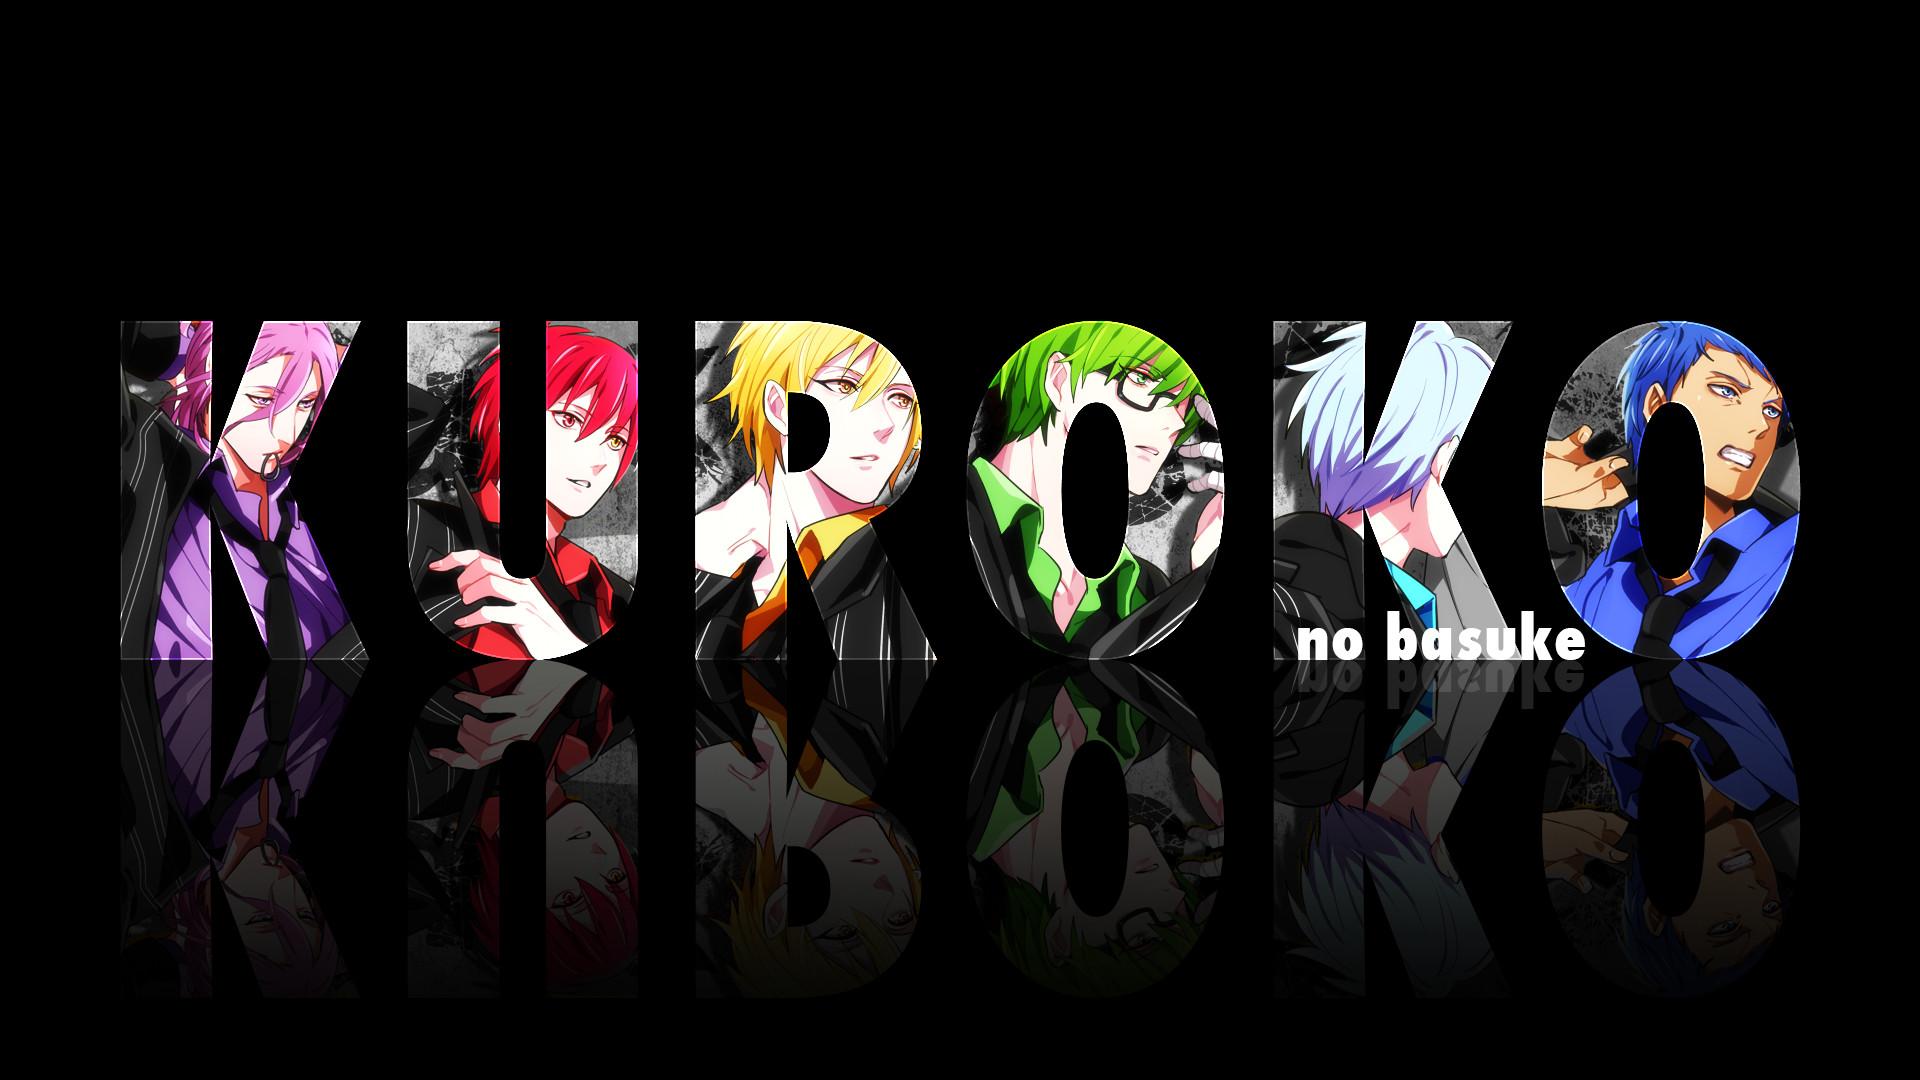 1920x1080 Anime Wallpapers Kuroko No Basuke HD 4K Download For Mobile IPhone PC